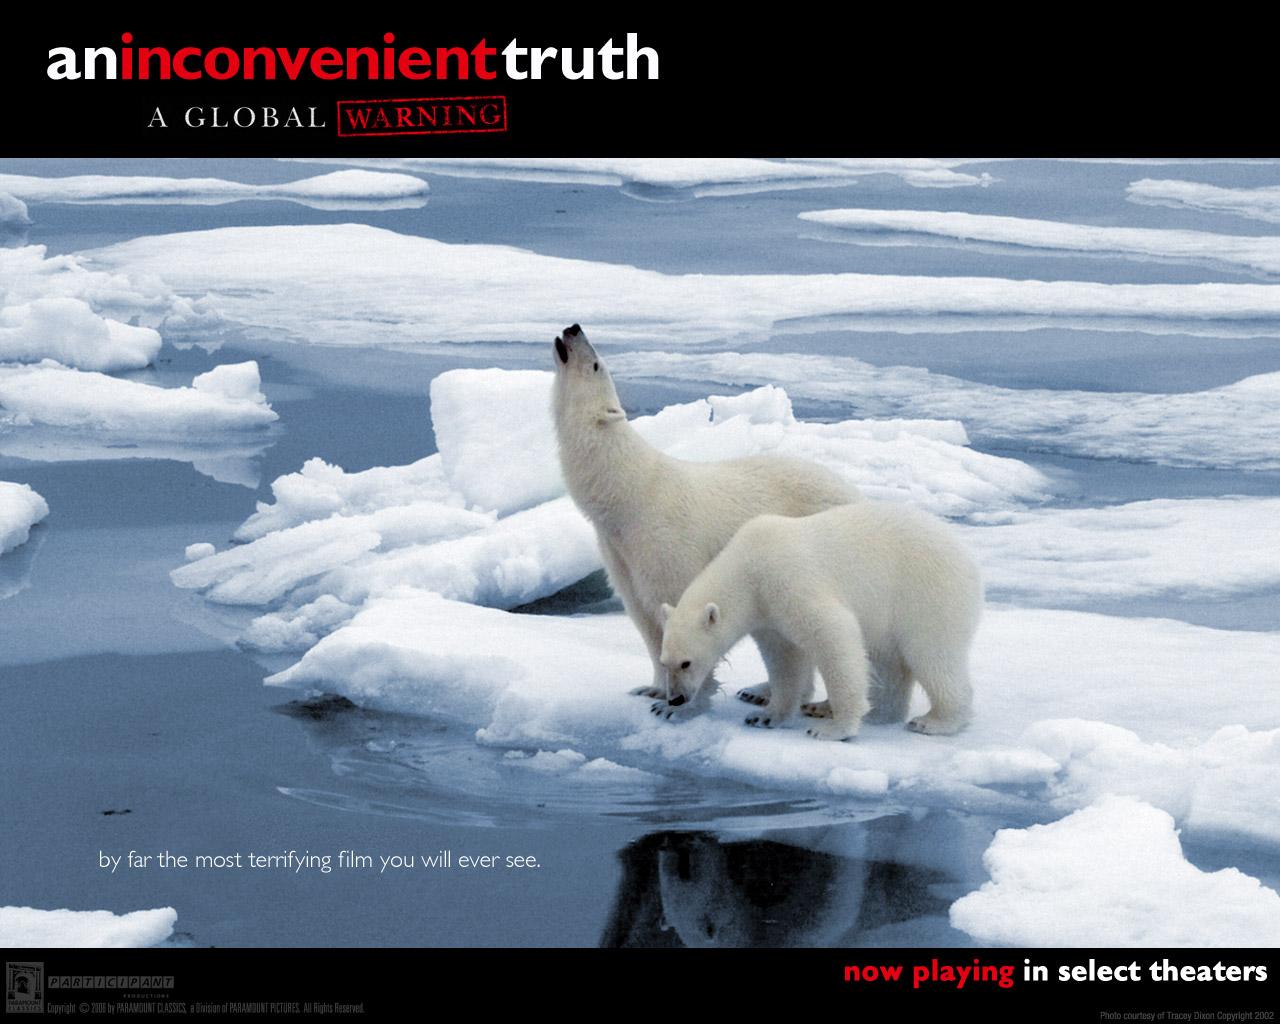 The Inconvenient Truth Movie